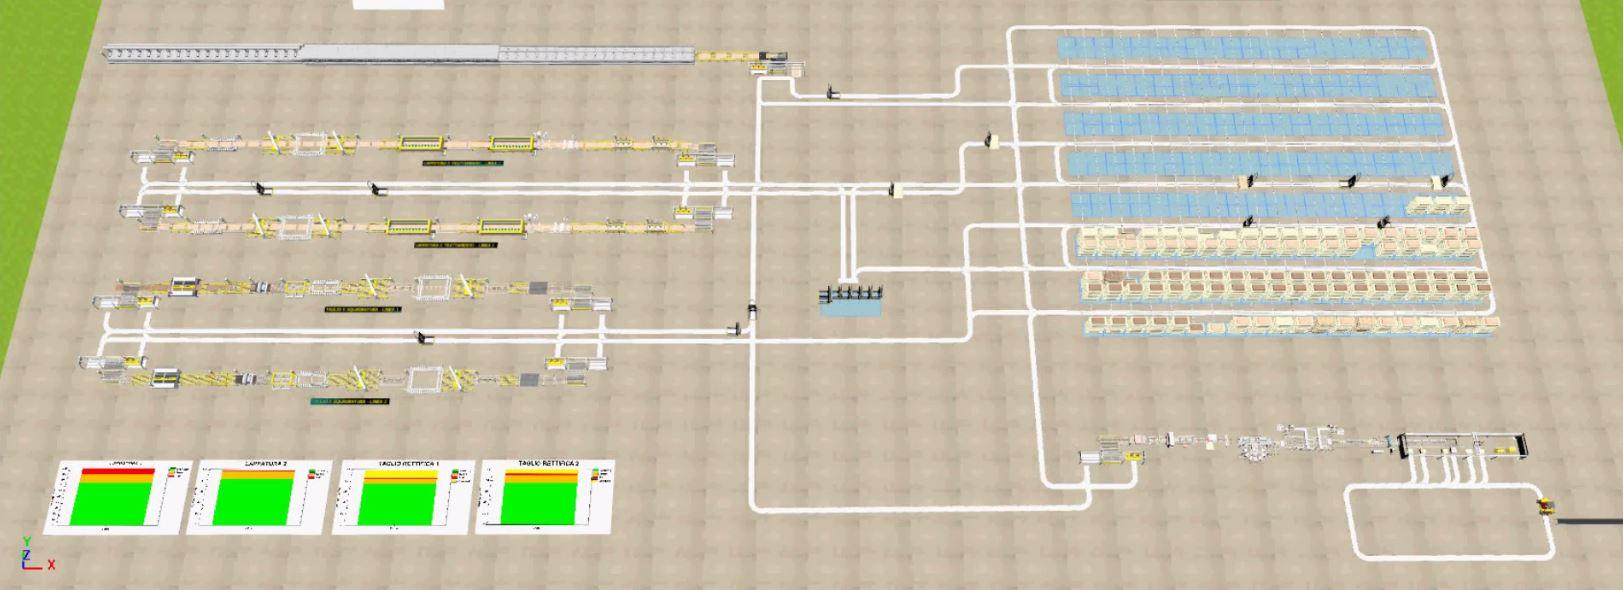 BMR's DIGITAL LINE AND 4.0 LOGISTICS